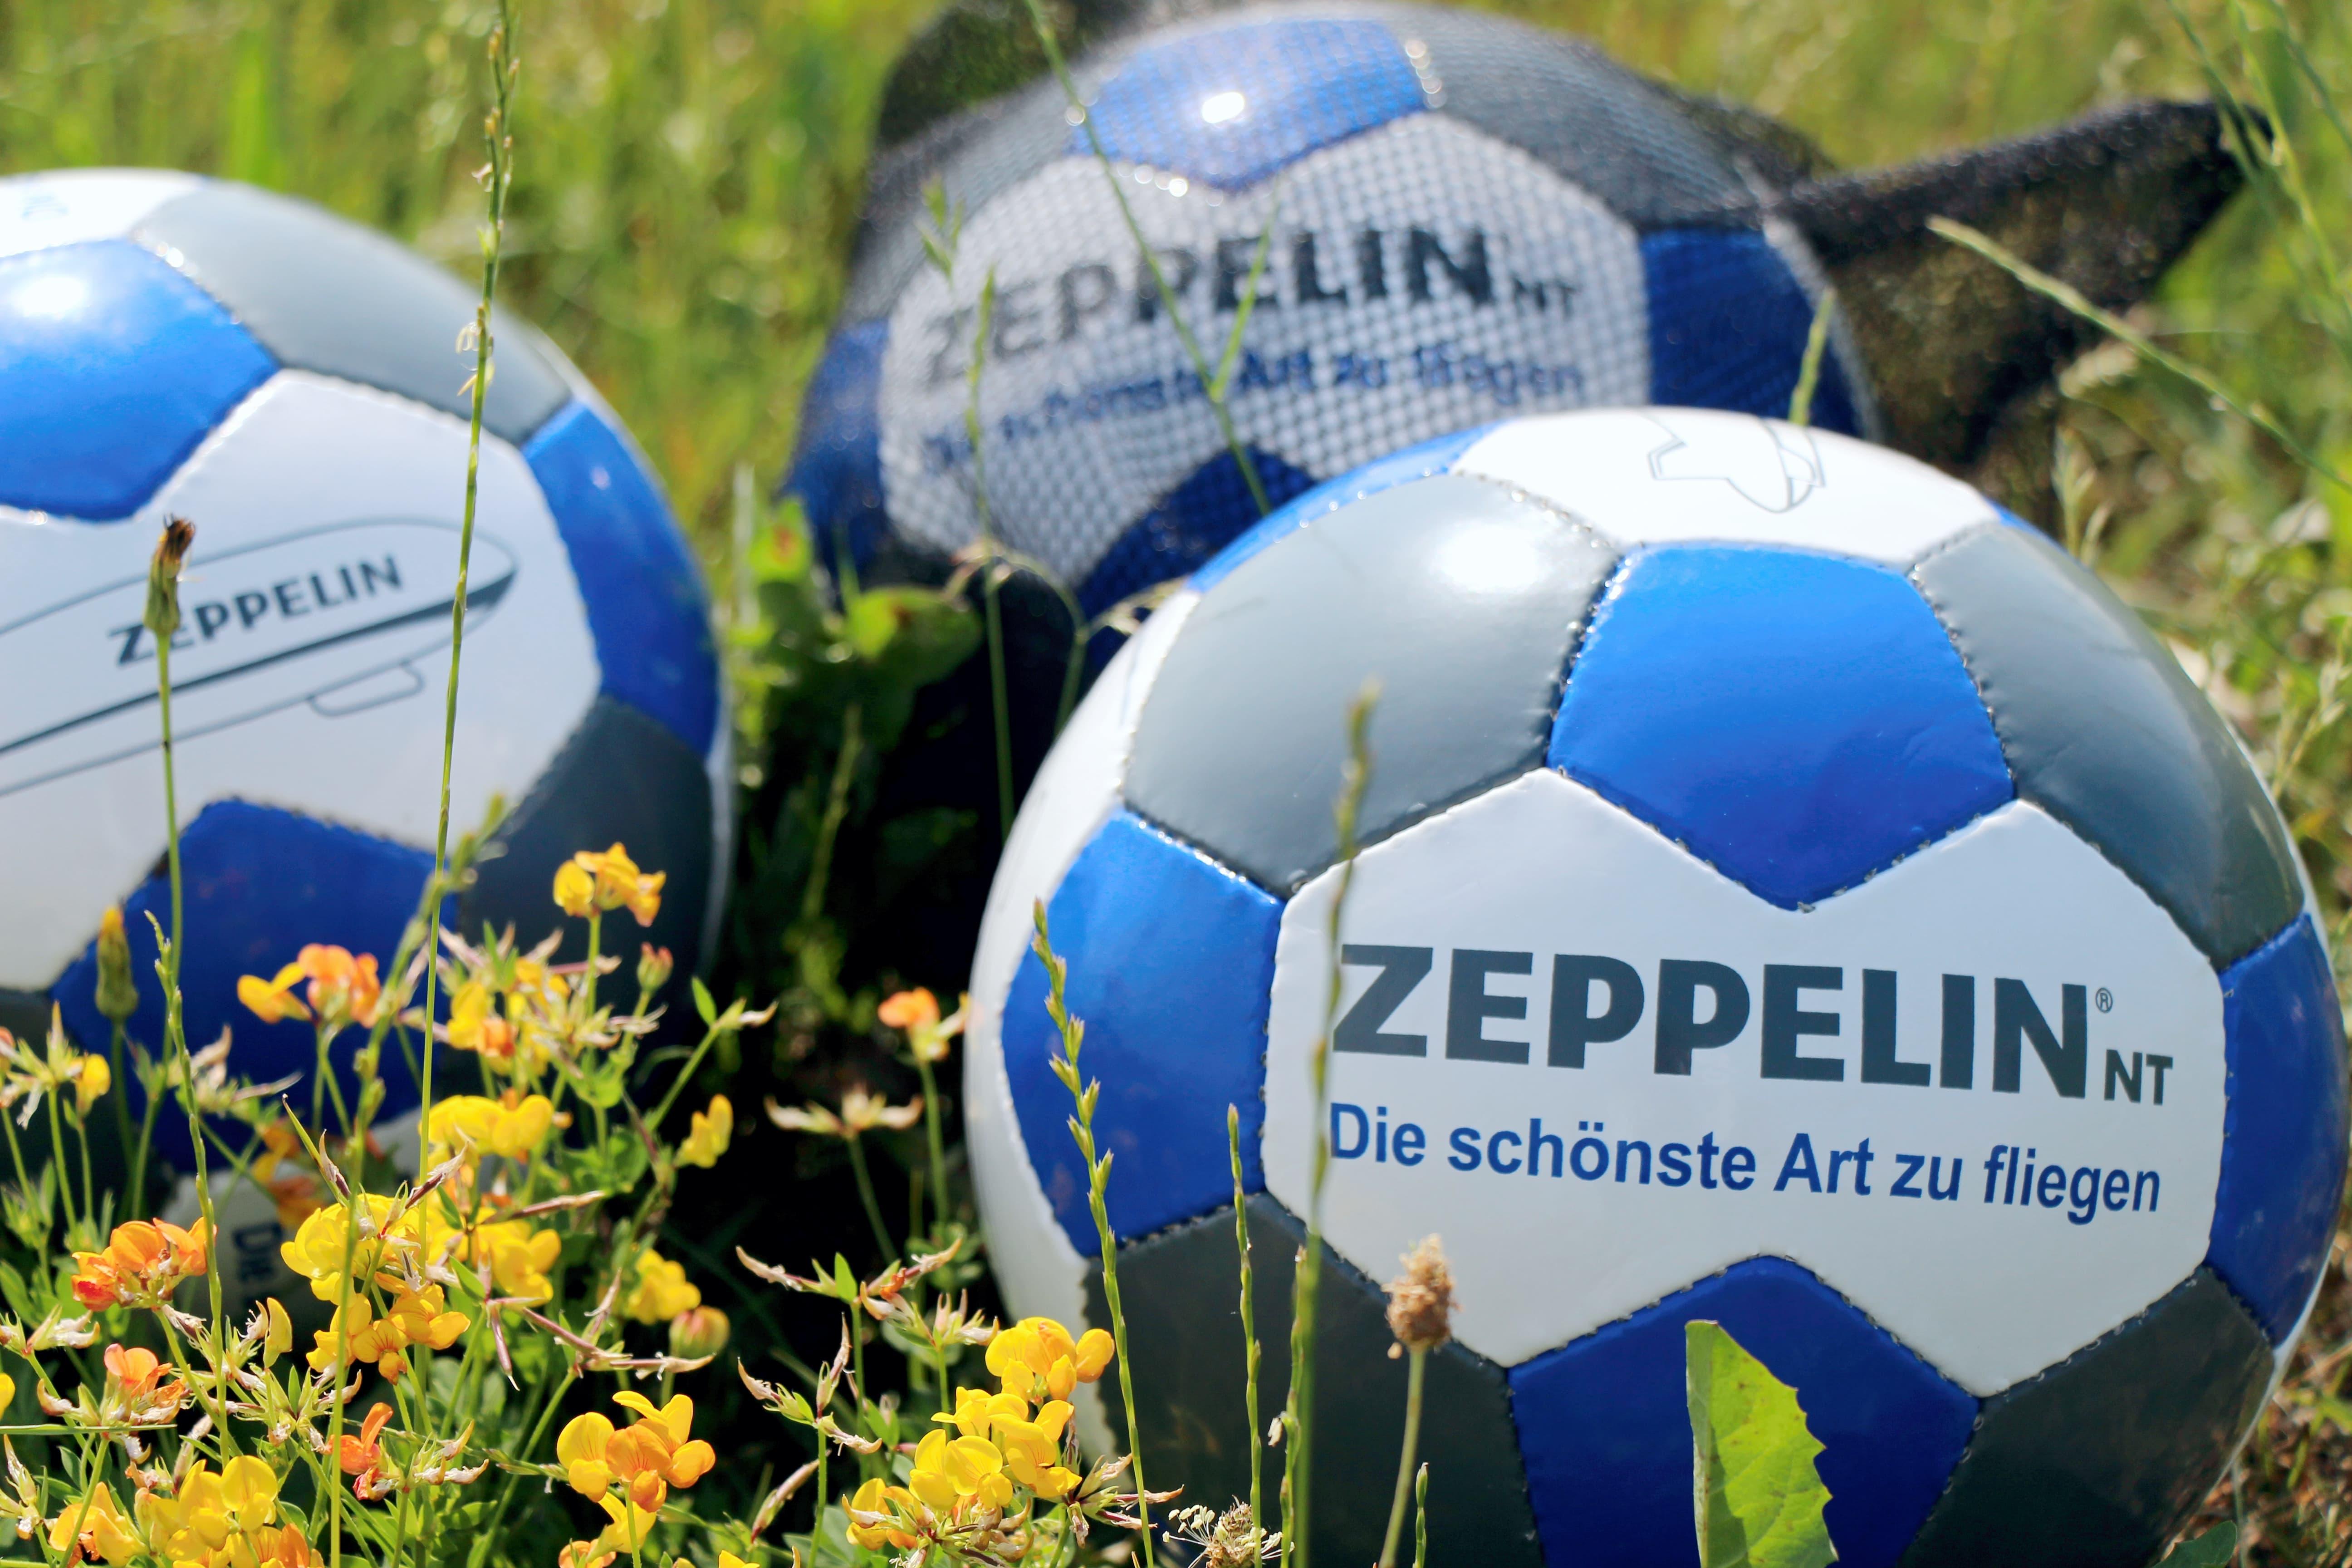 zeppelin fu ball gr e 5 zeppelin nt fanshop. Black Bedroom Furniture Sets. Home Design Ideas